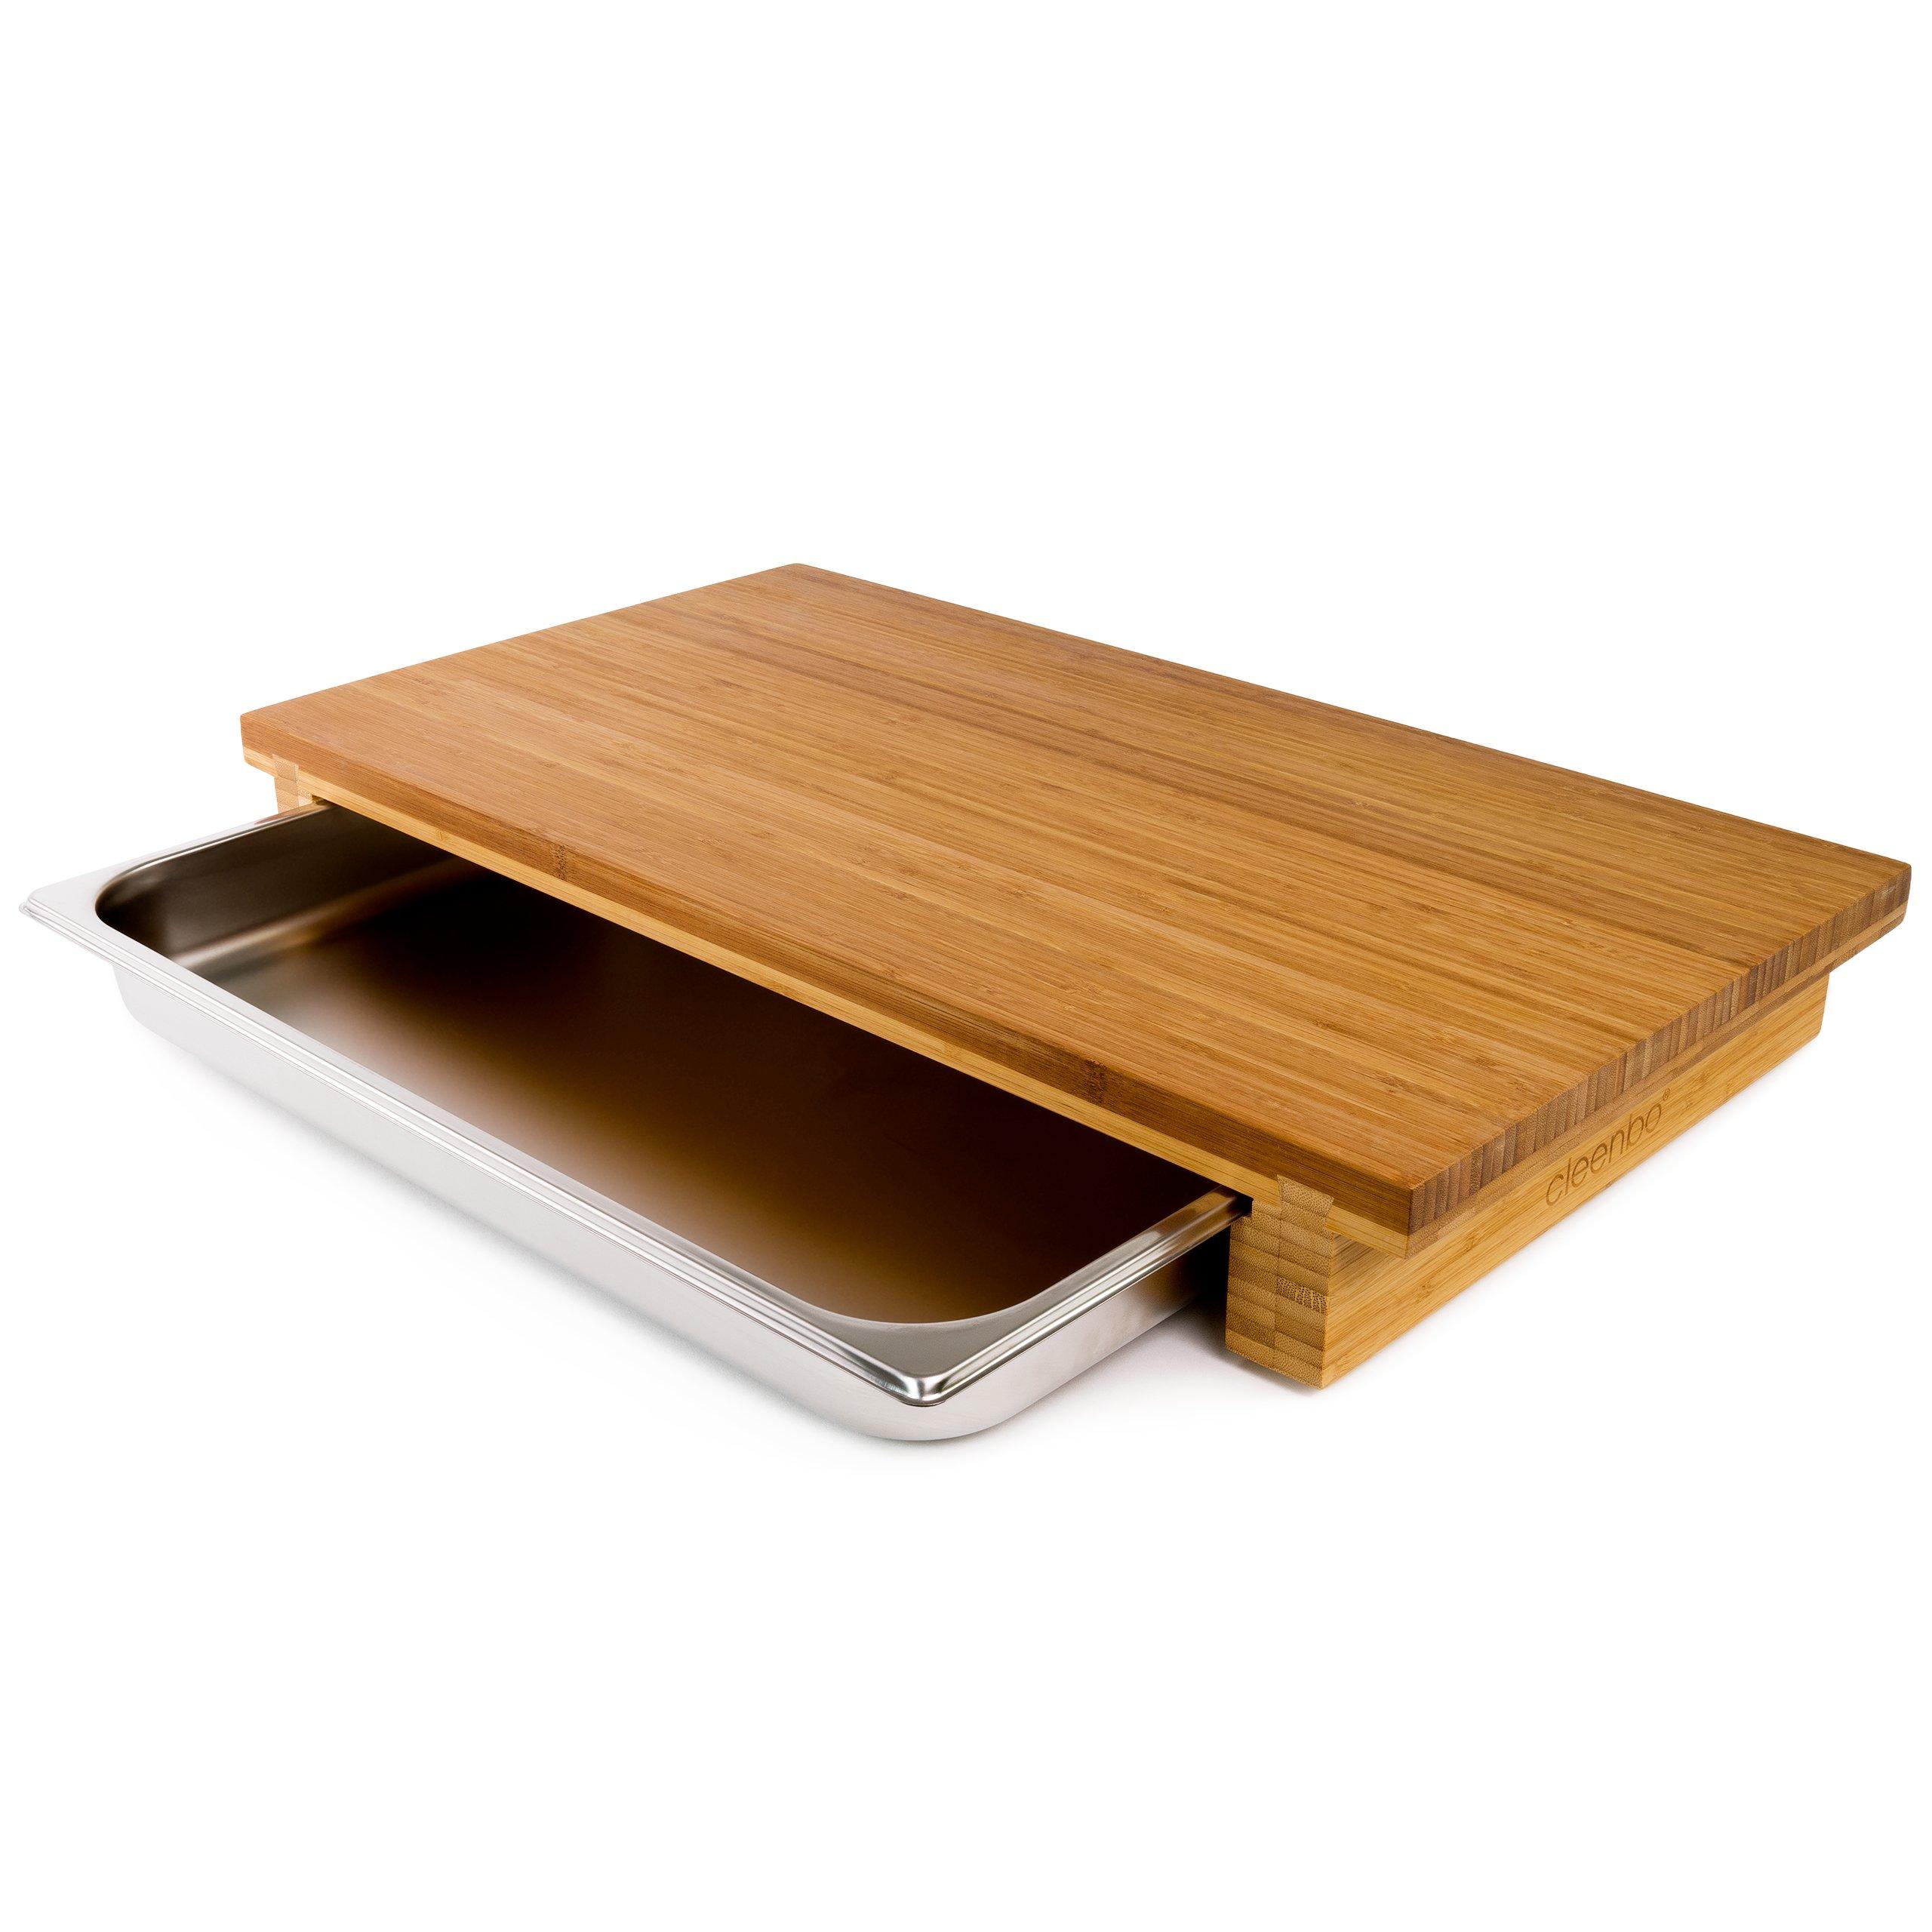 bambus schneidebrett bambus schneidebrett accessoires zubeh r grillgoods stylisches cleenbo. Black Bedroom Furniture Sets. Home Design Ideas